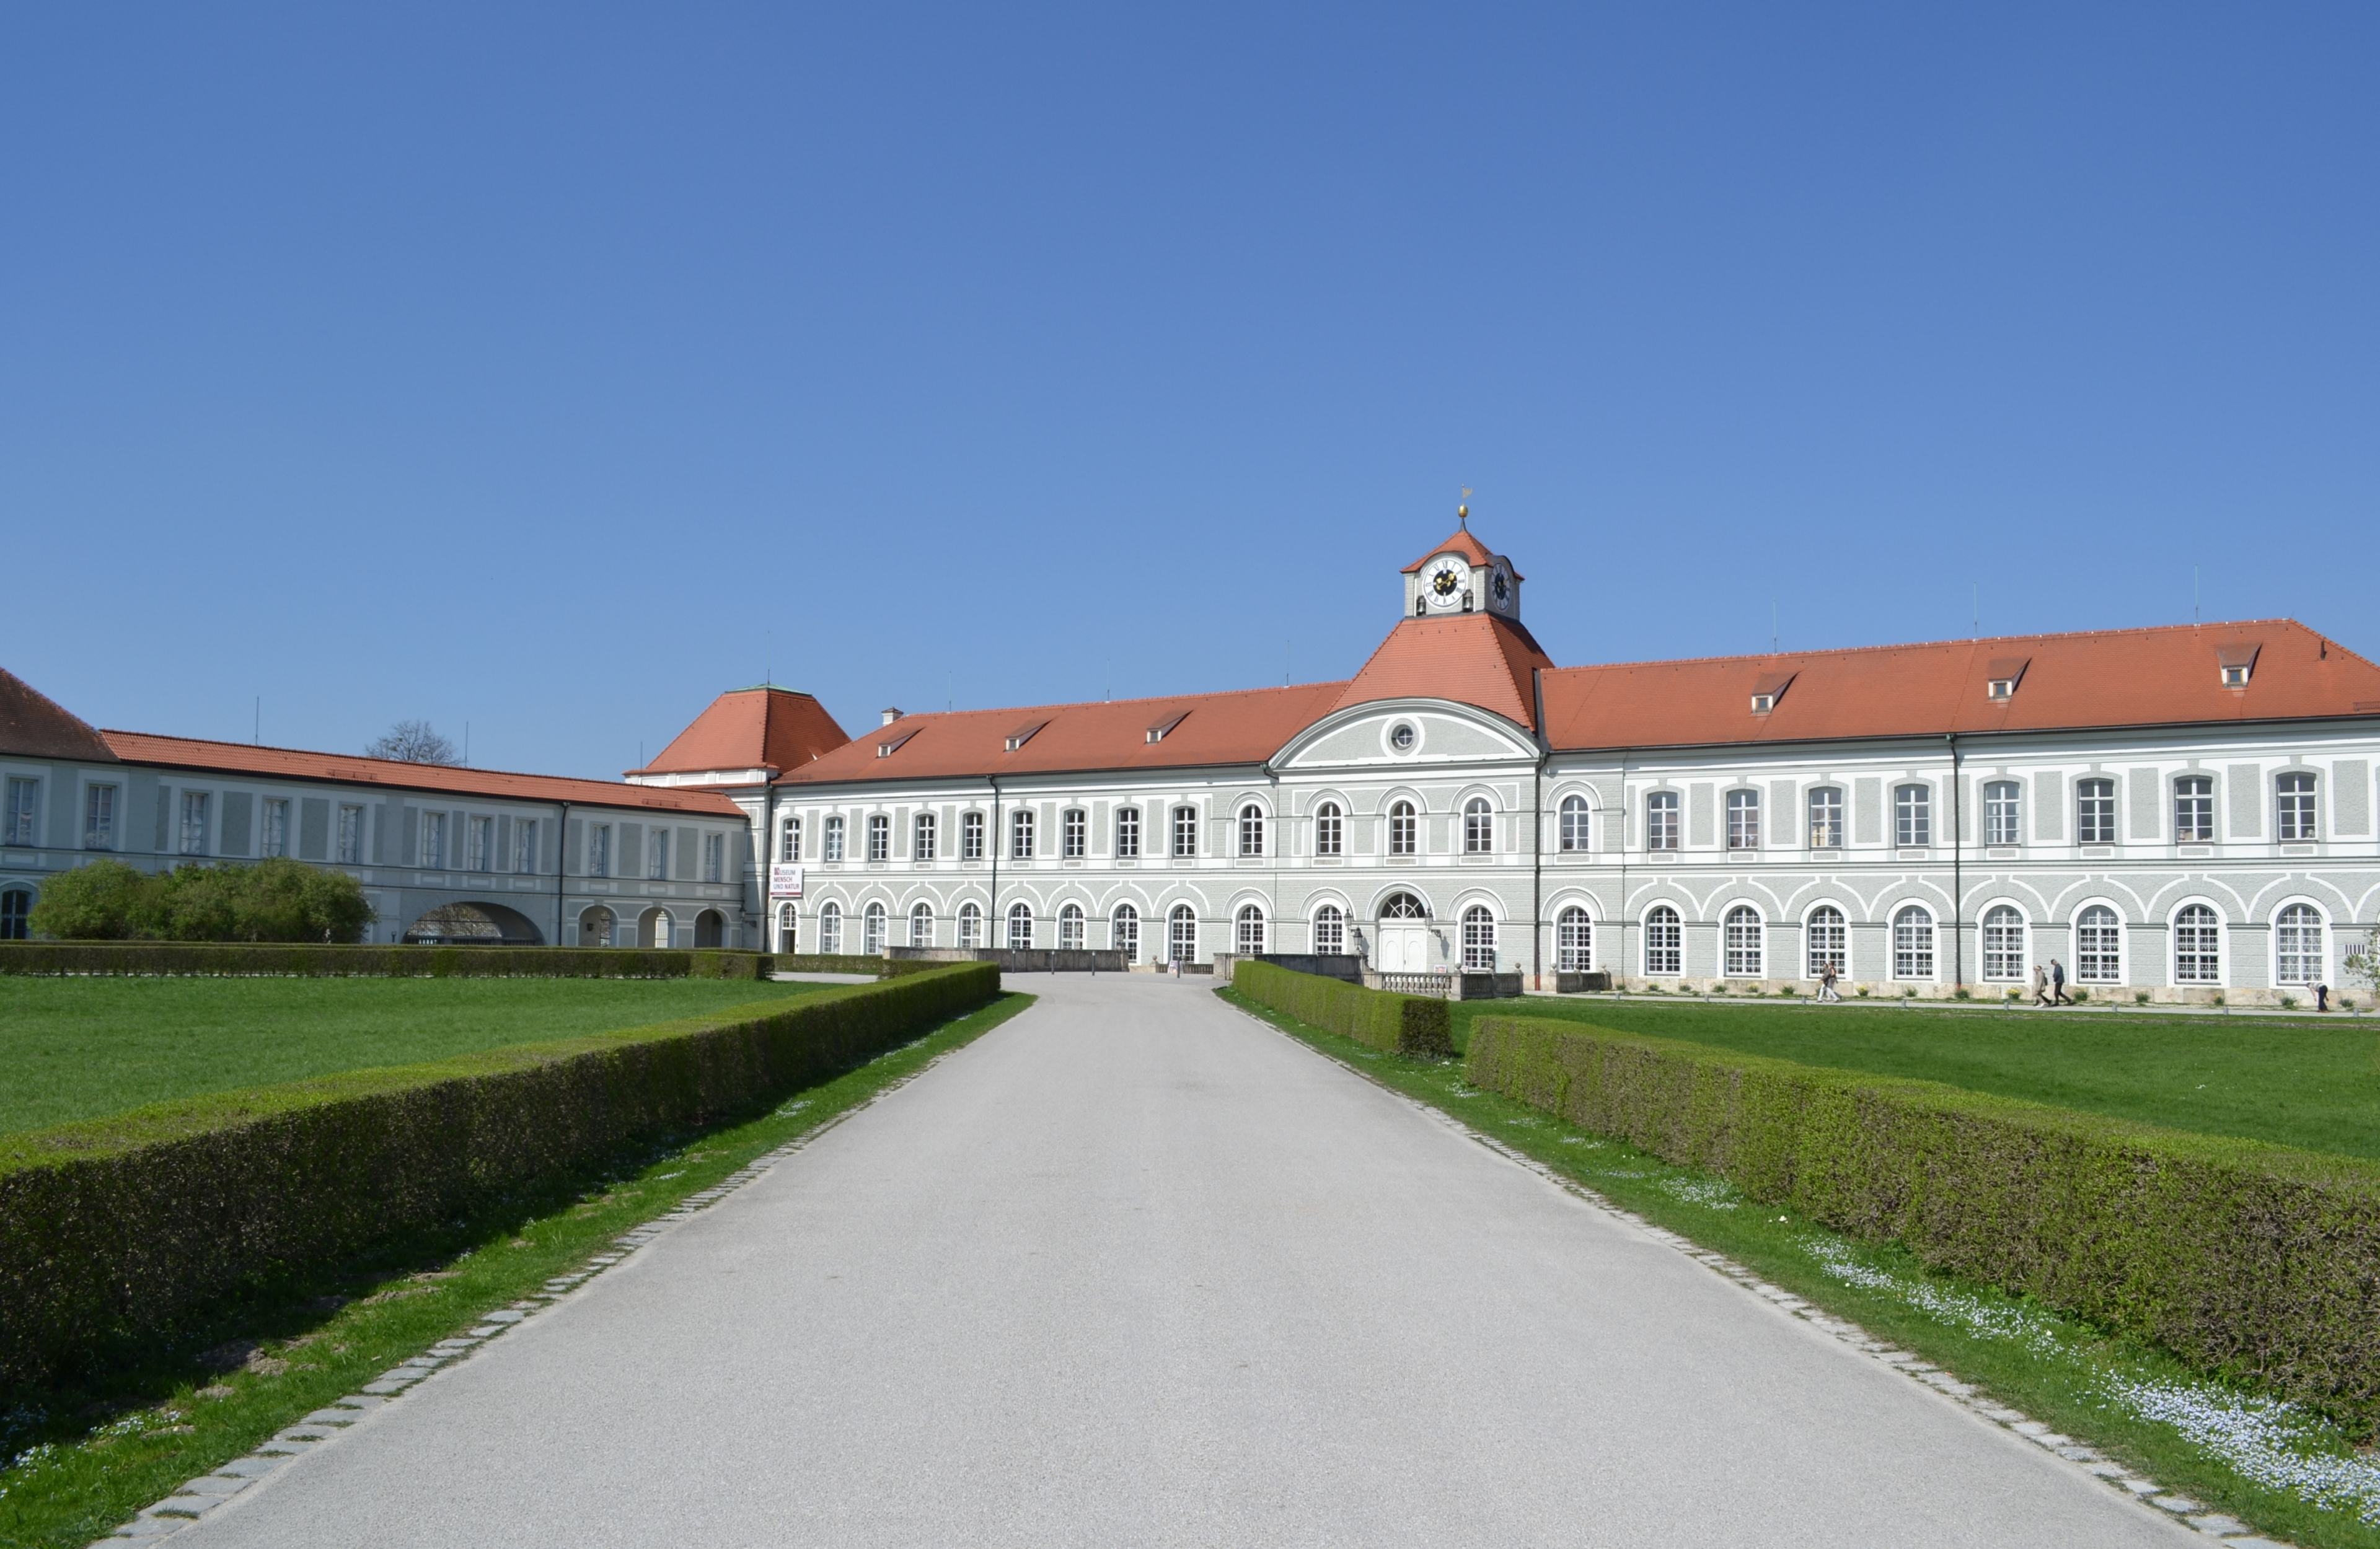 File:Schloss Nymphenburg in München.JPG - Wikimedia Commons